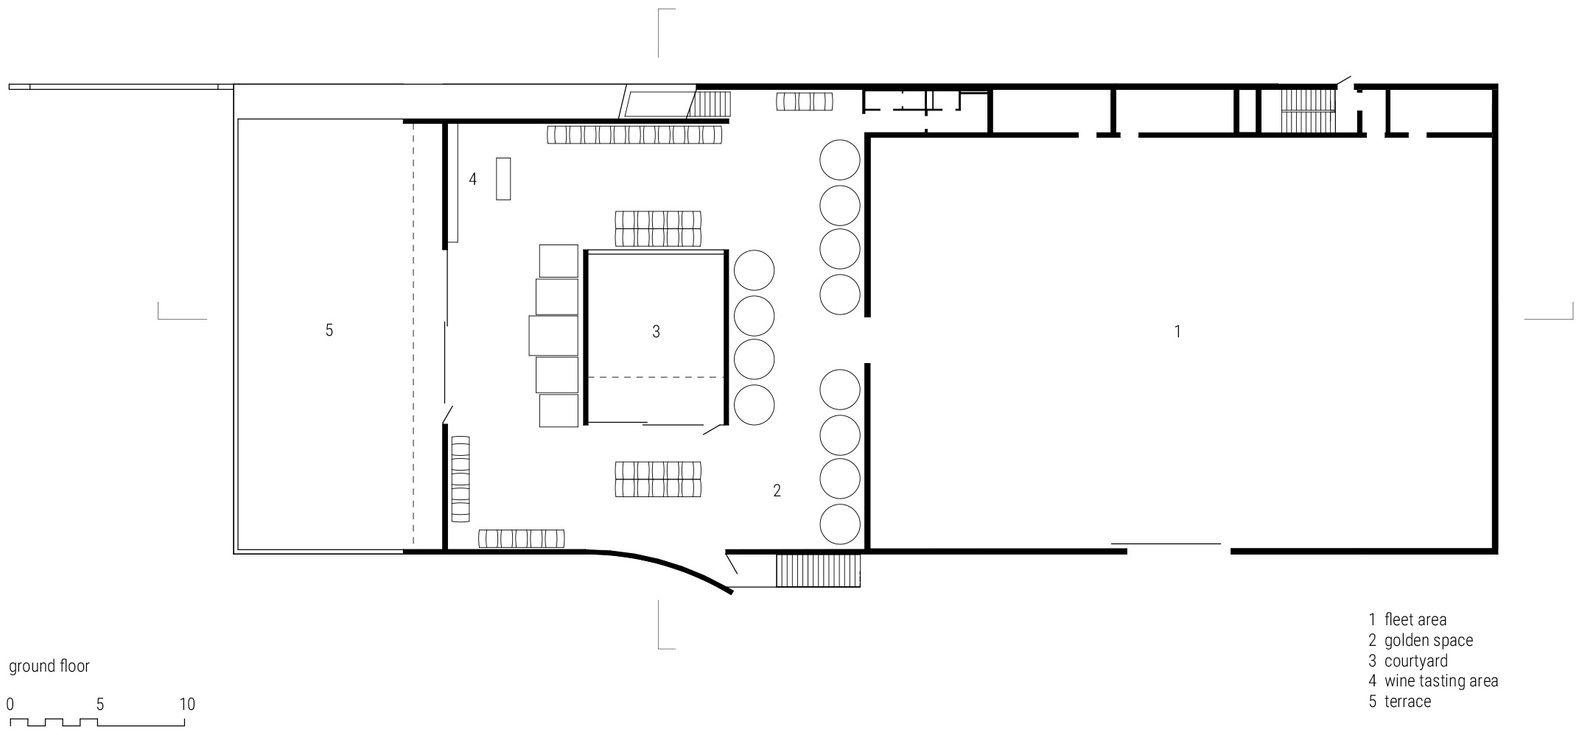 Gallery Of Wine Cellar Dockner Goebl Architecture 19 Wine Cellar Architecture Gallery